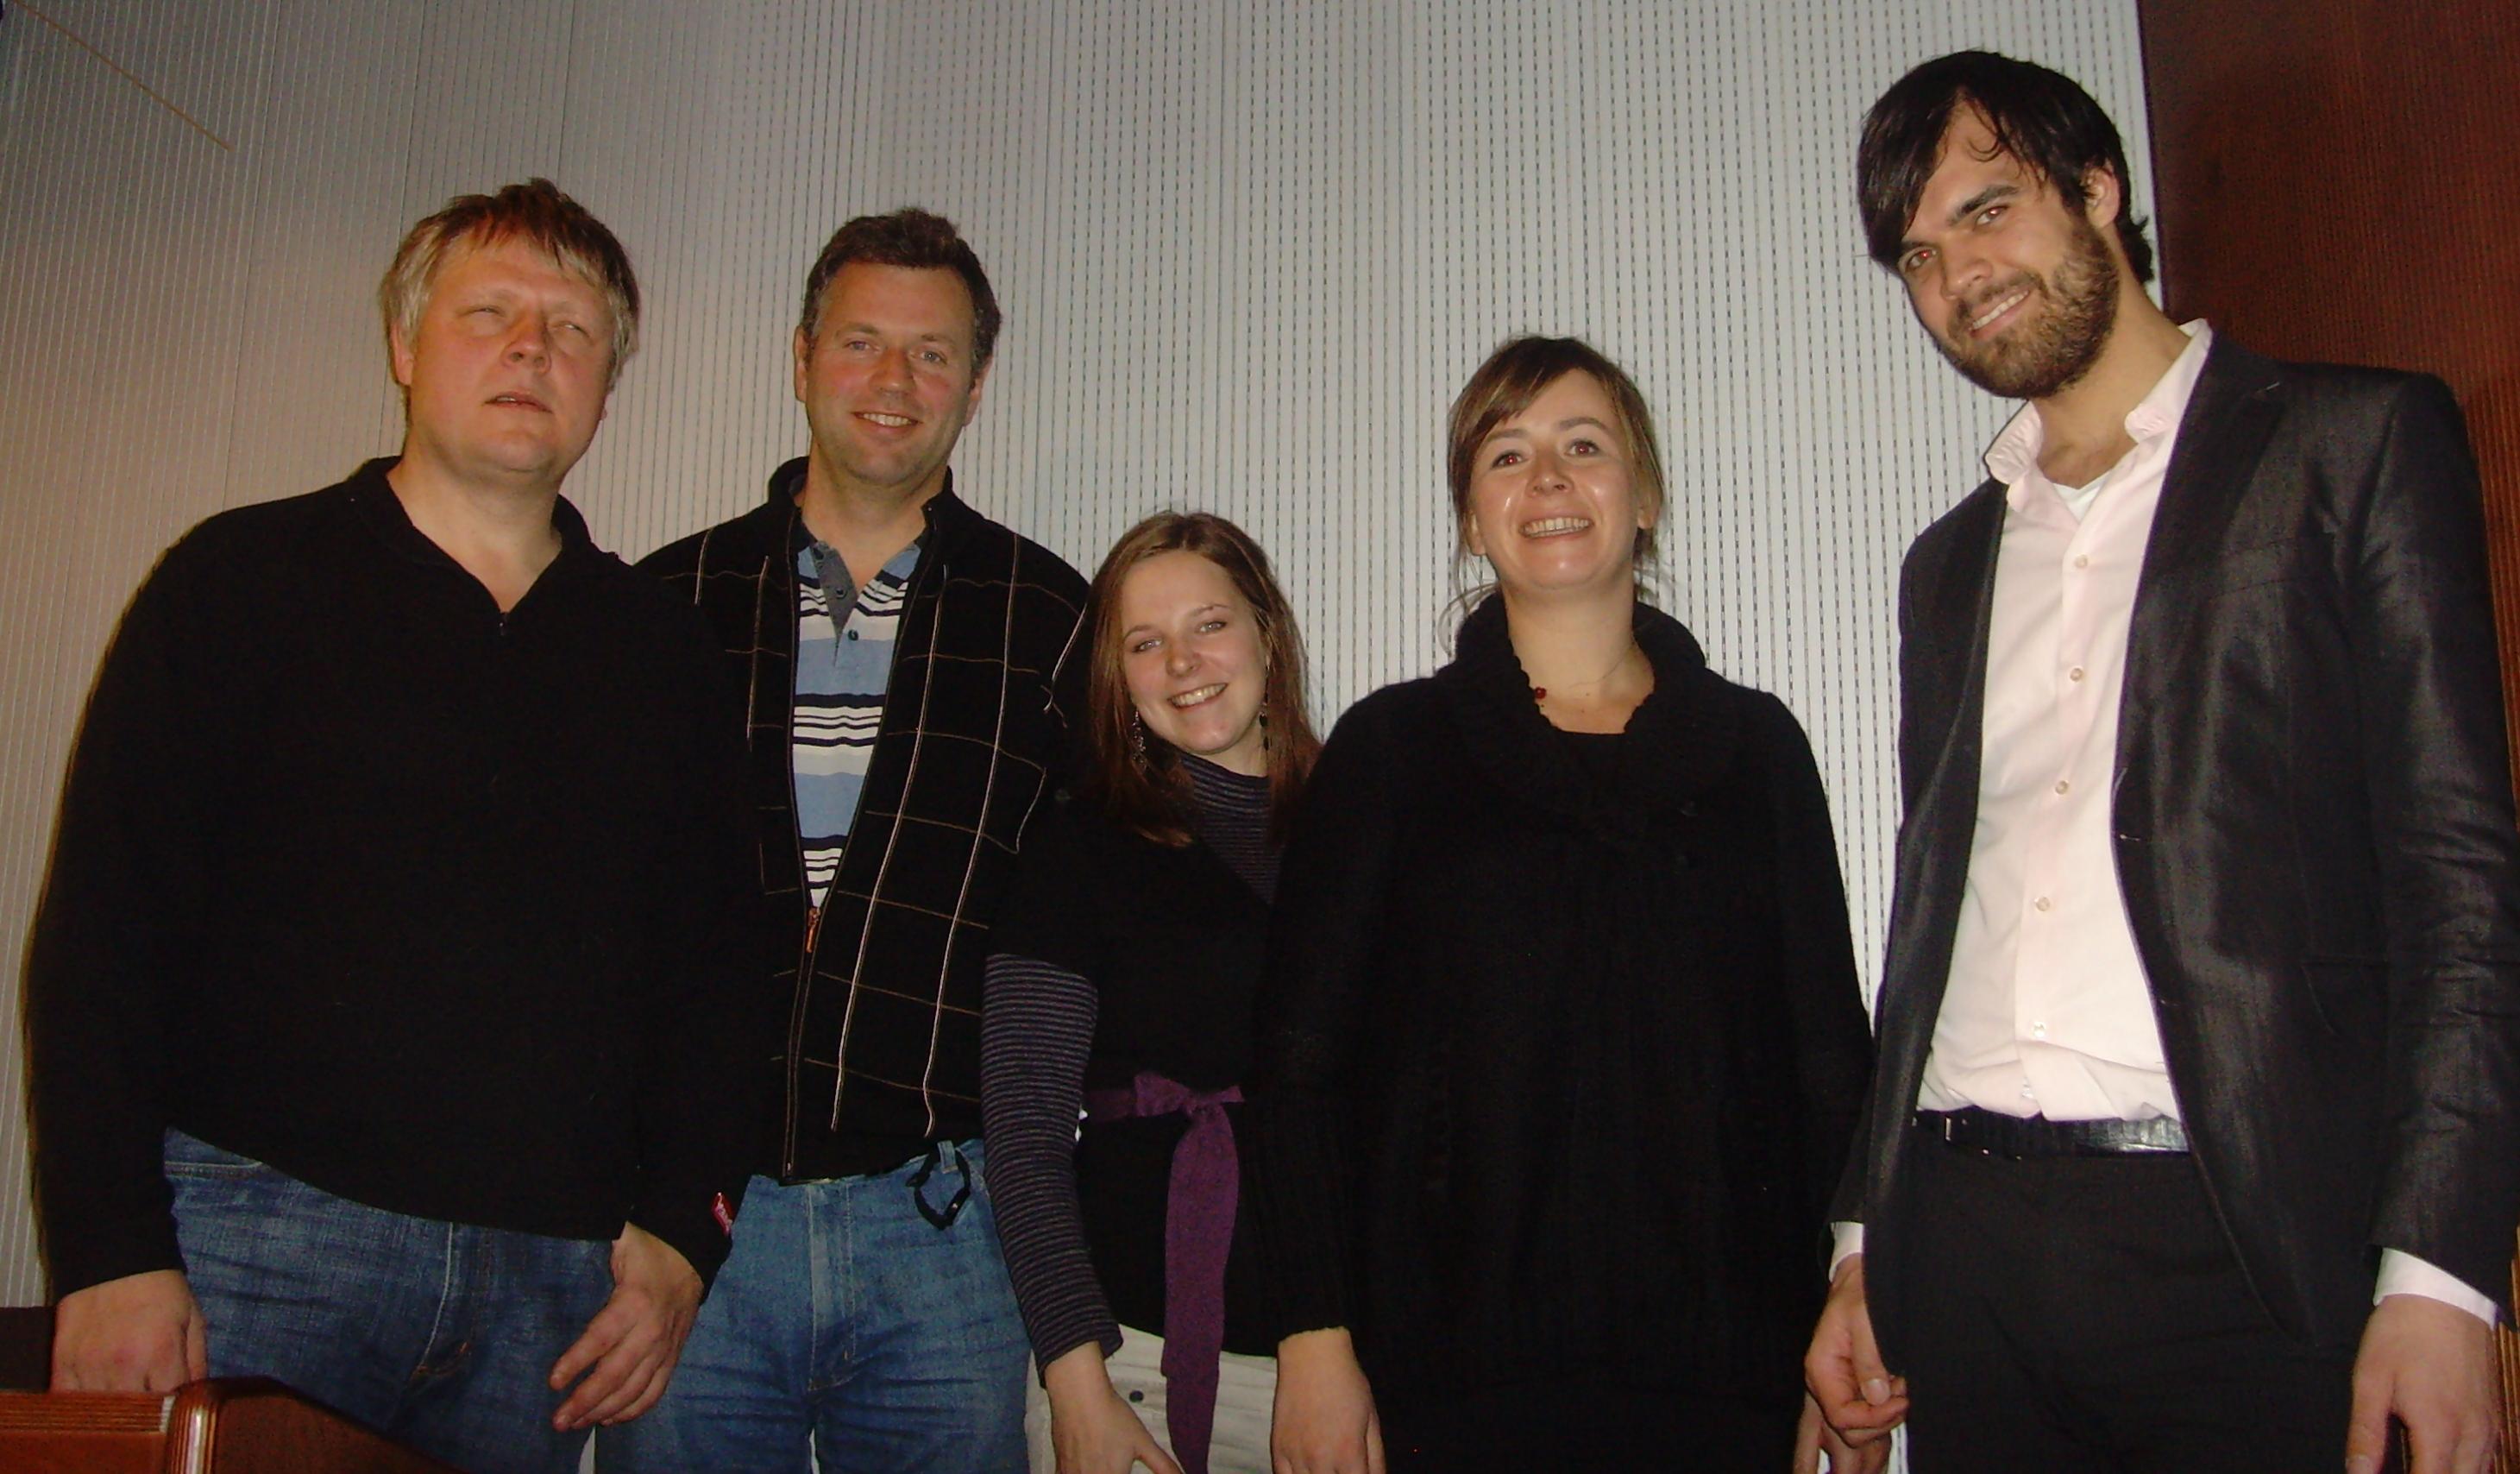 [Bilde: Viser Morten Tollefsen (MediaLT), Knut Kvale (Telenor), Miriam Nes Begnum (MediaLT), Heidi Arnesen Austlid (FriProgsenteret) og Jørund Leknes (FAD)]